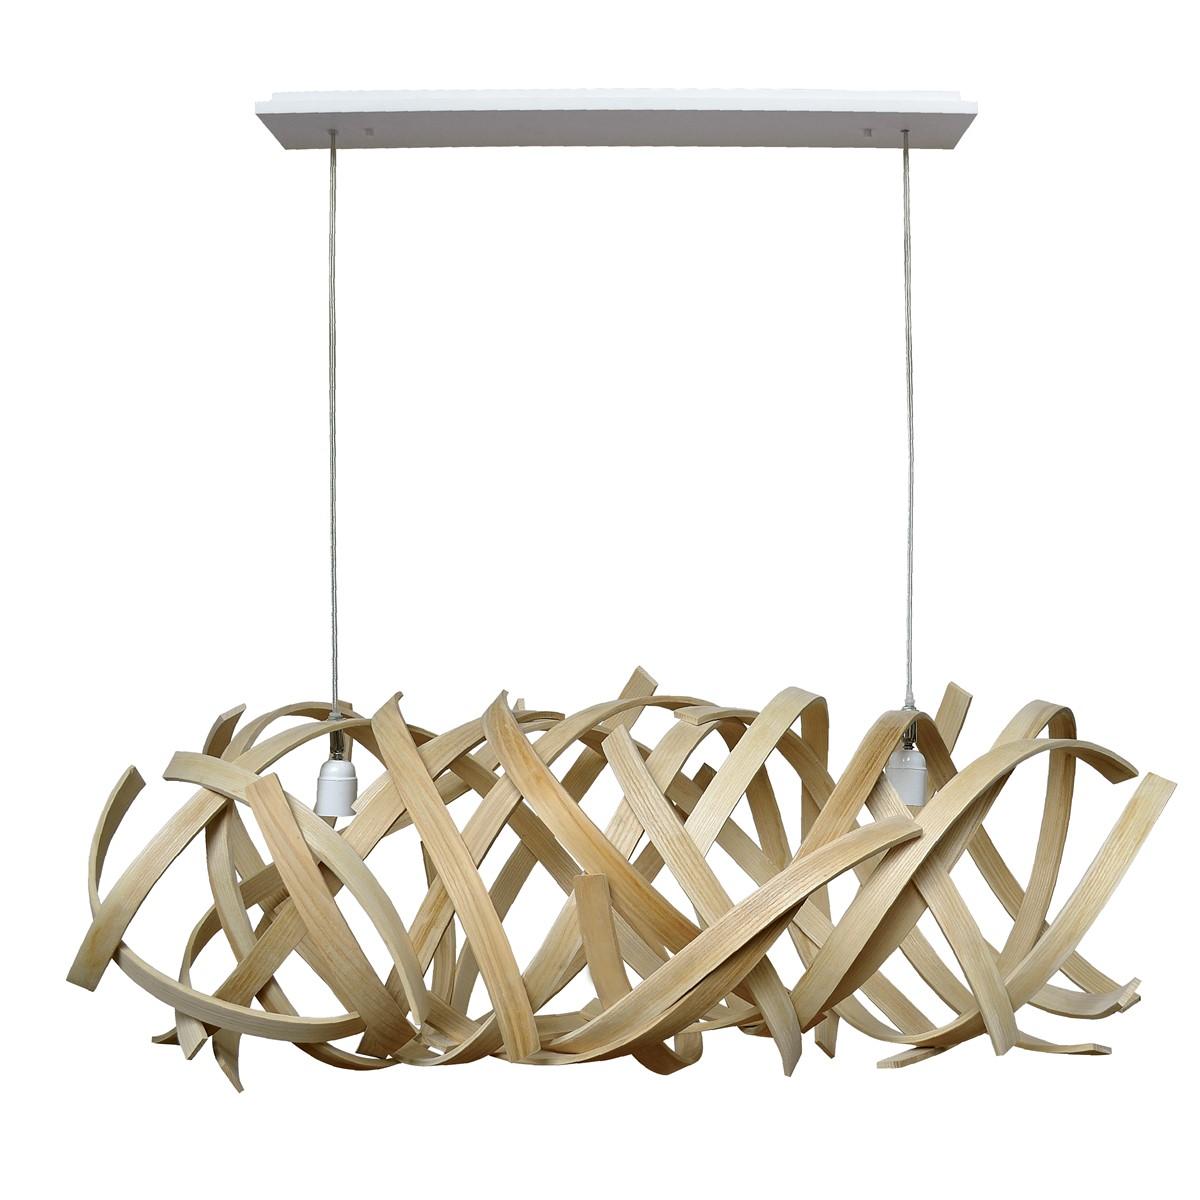 Lustre Design Bois : Lustre design en bois Lola LIMELO DESIGN